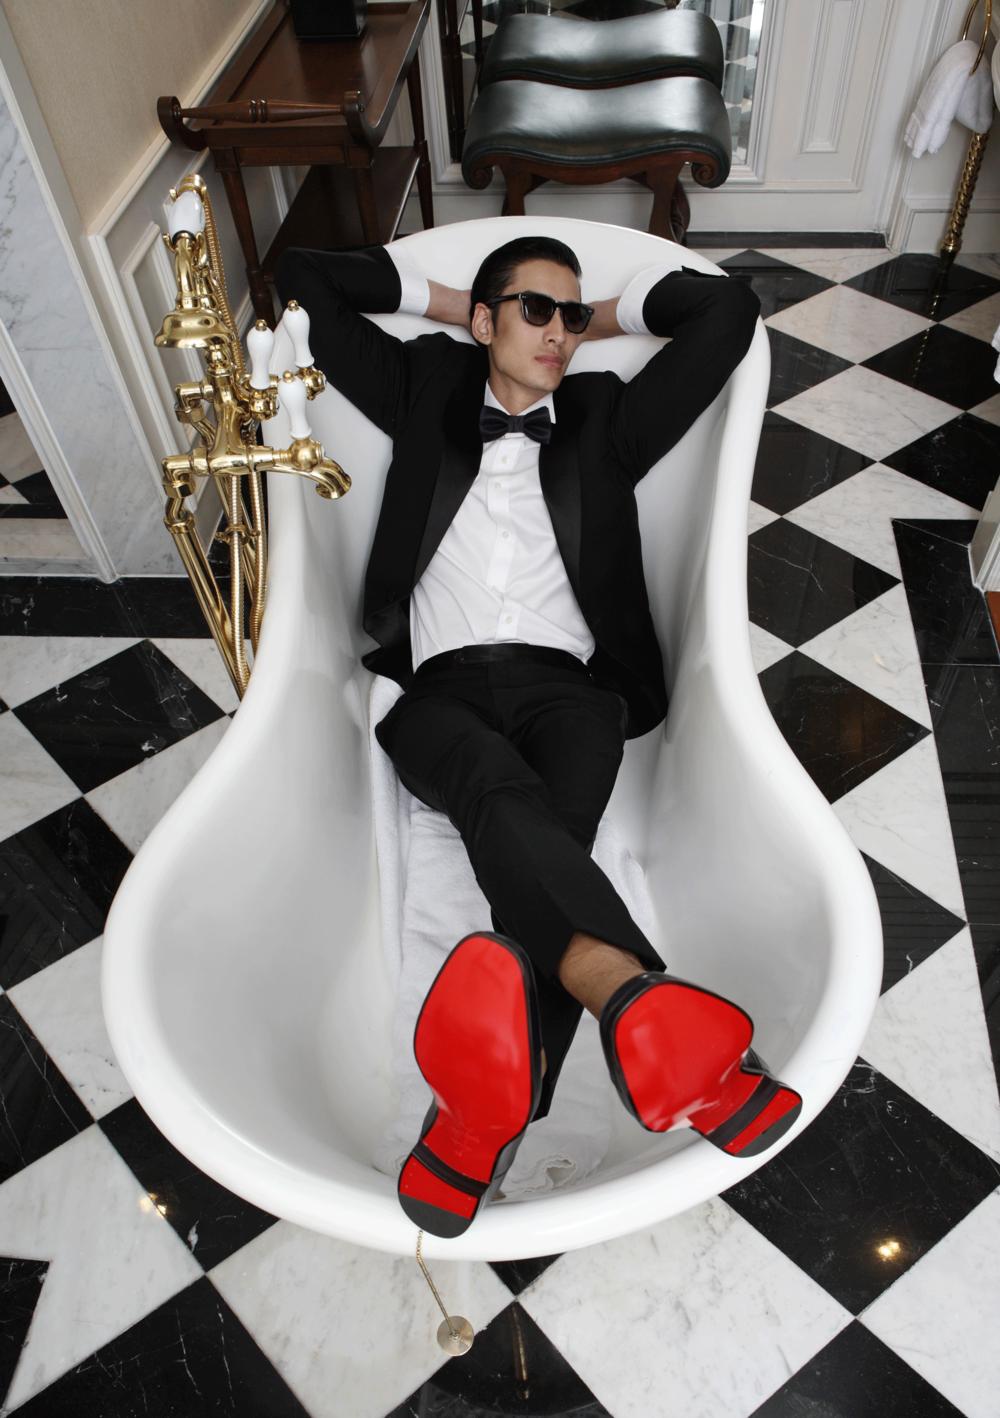 clothes : VVONSUGUNNASIL / shoes : Christian Louboutin / sunglasses : Blake Kuwahara